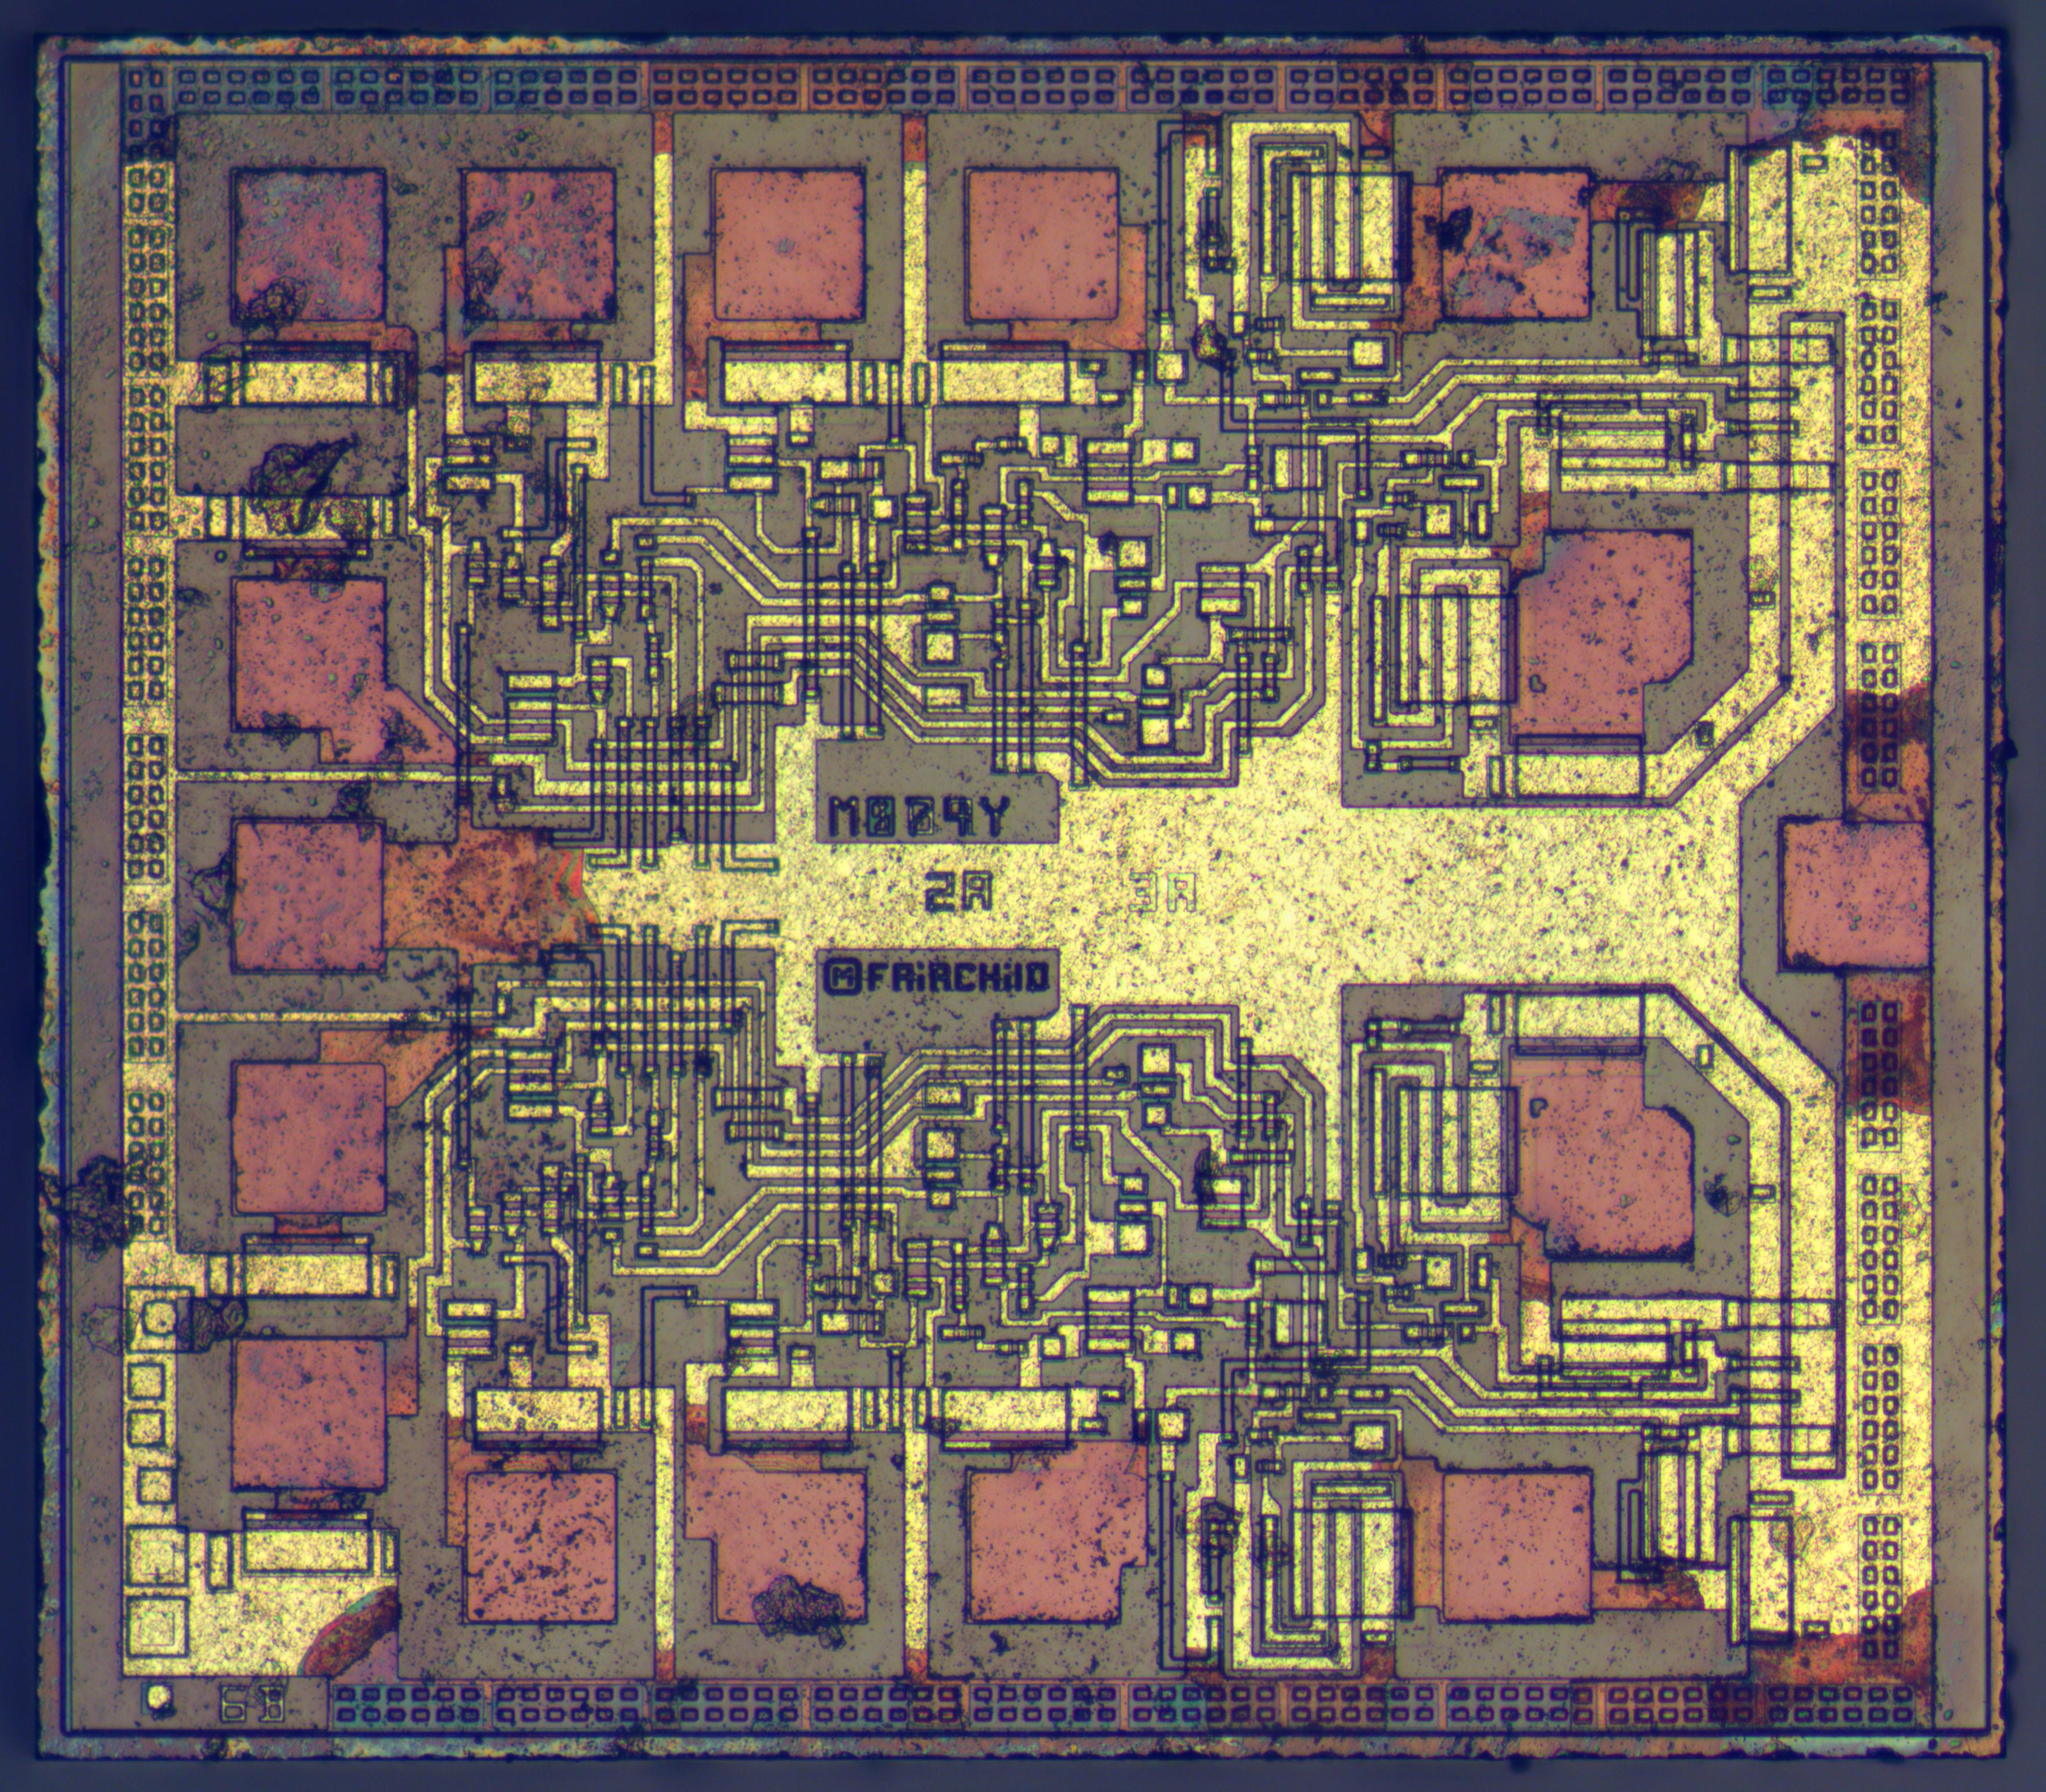 Zeptobars 7400 Ic Chip For Pinterest Fairchild 74f109pc Dual Jk Flip Flop Weekend Die Shot